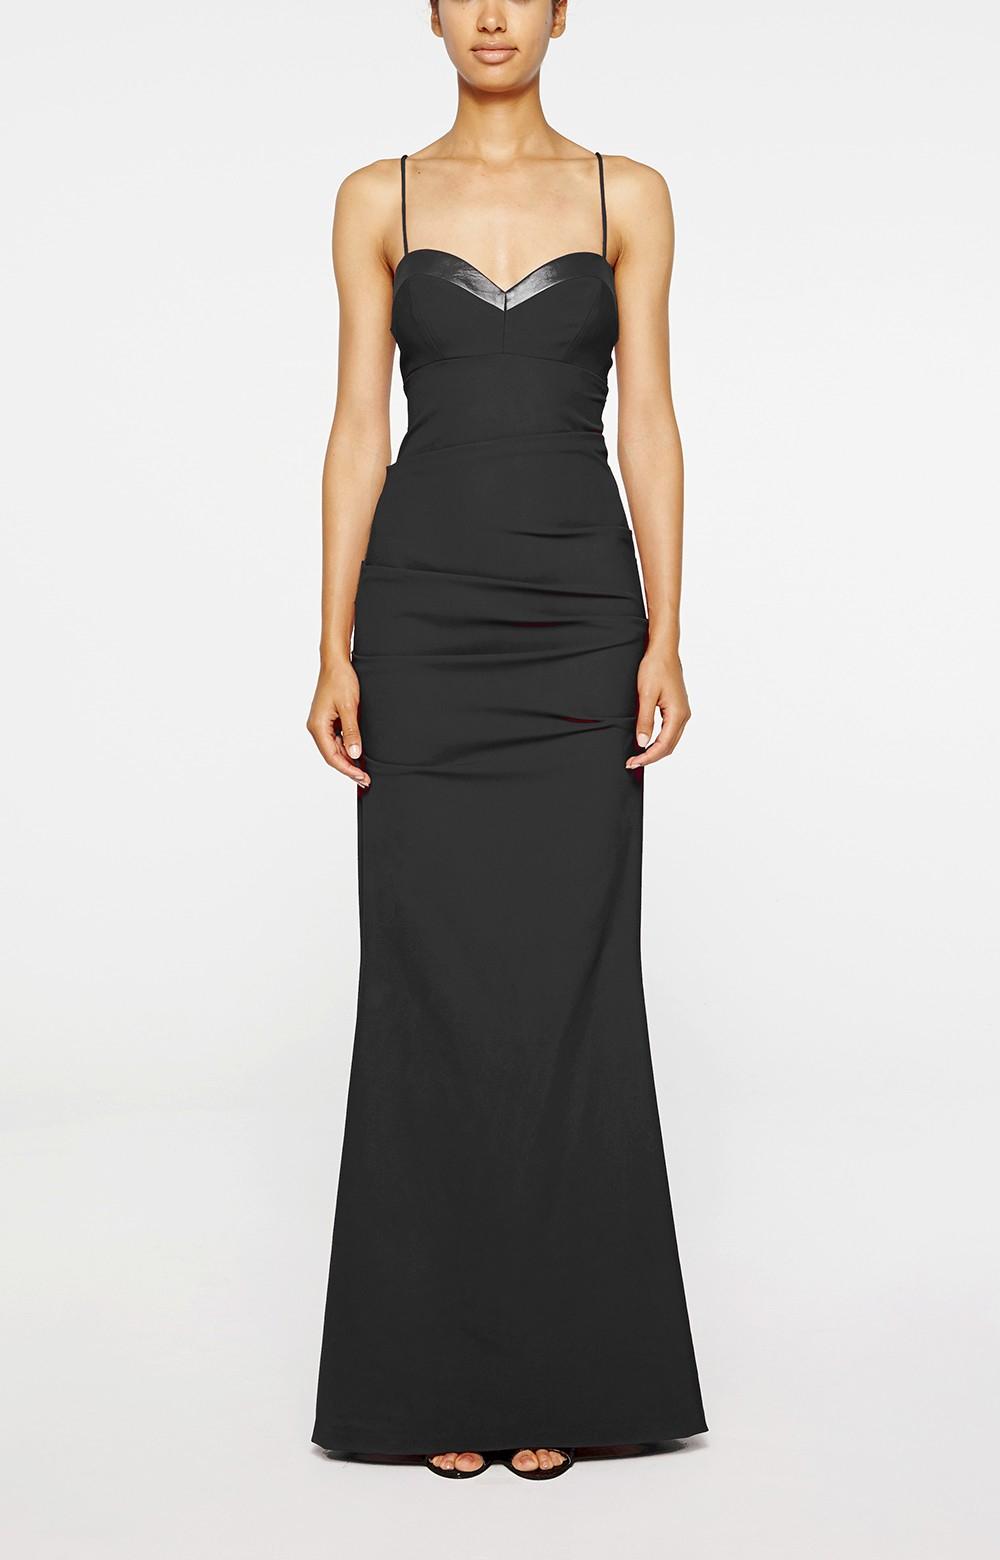 Lyst - Nicole Miller Sweetheart Tuck Gown in Black